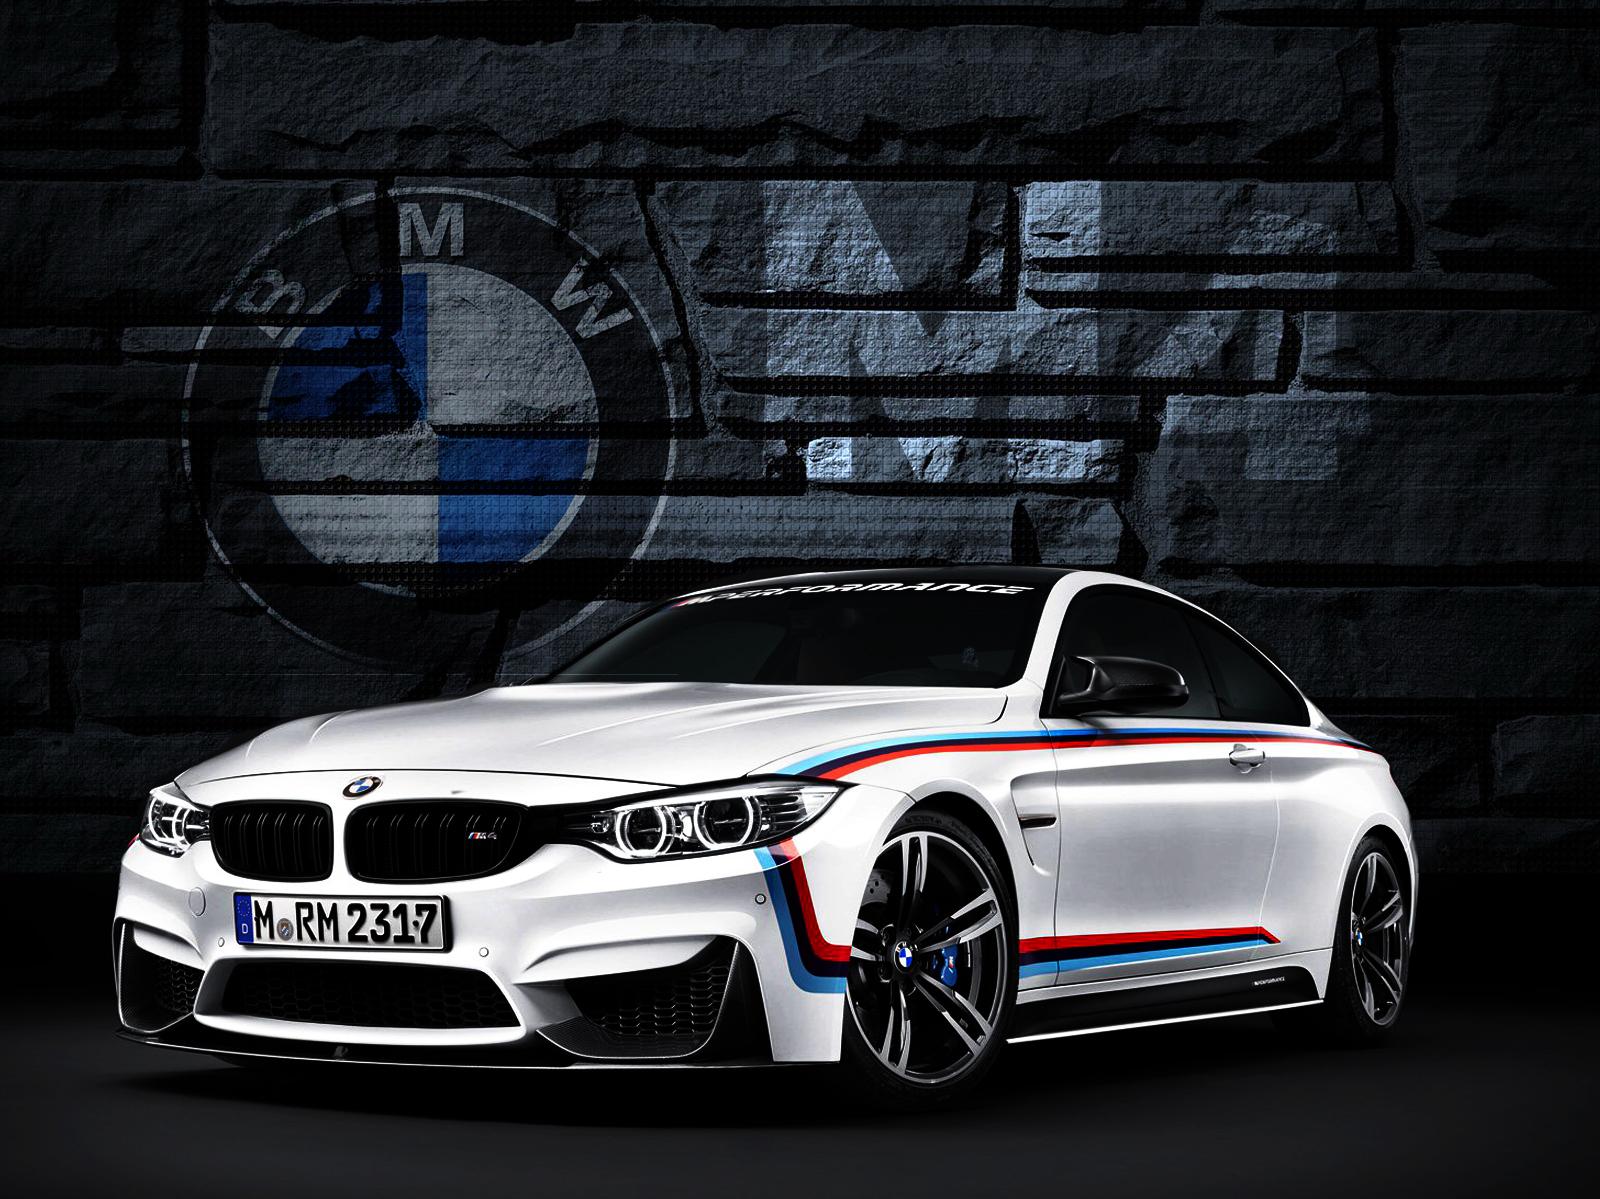 Gallery: BMW M4 Wallpaper HD Dekstop 2016